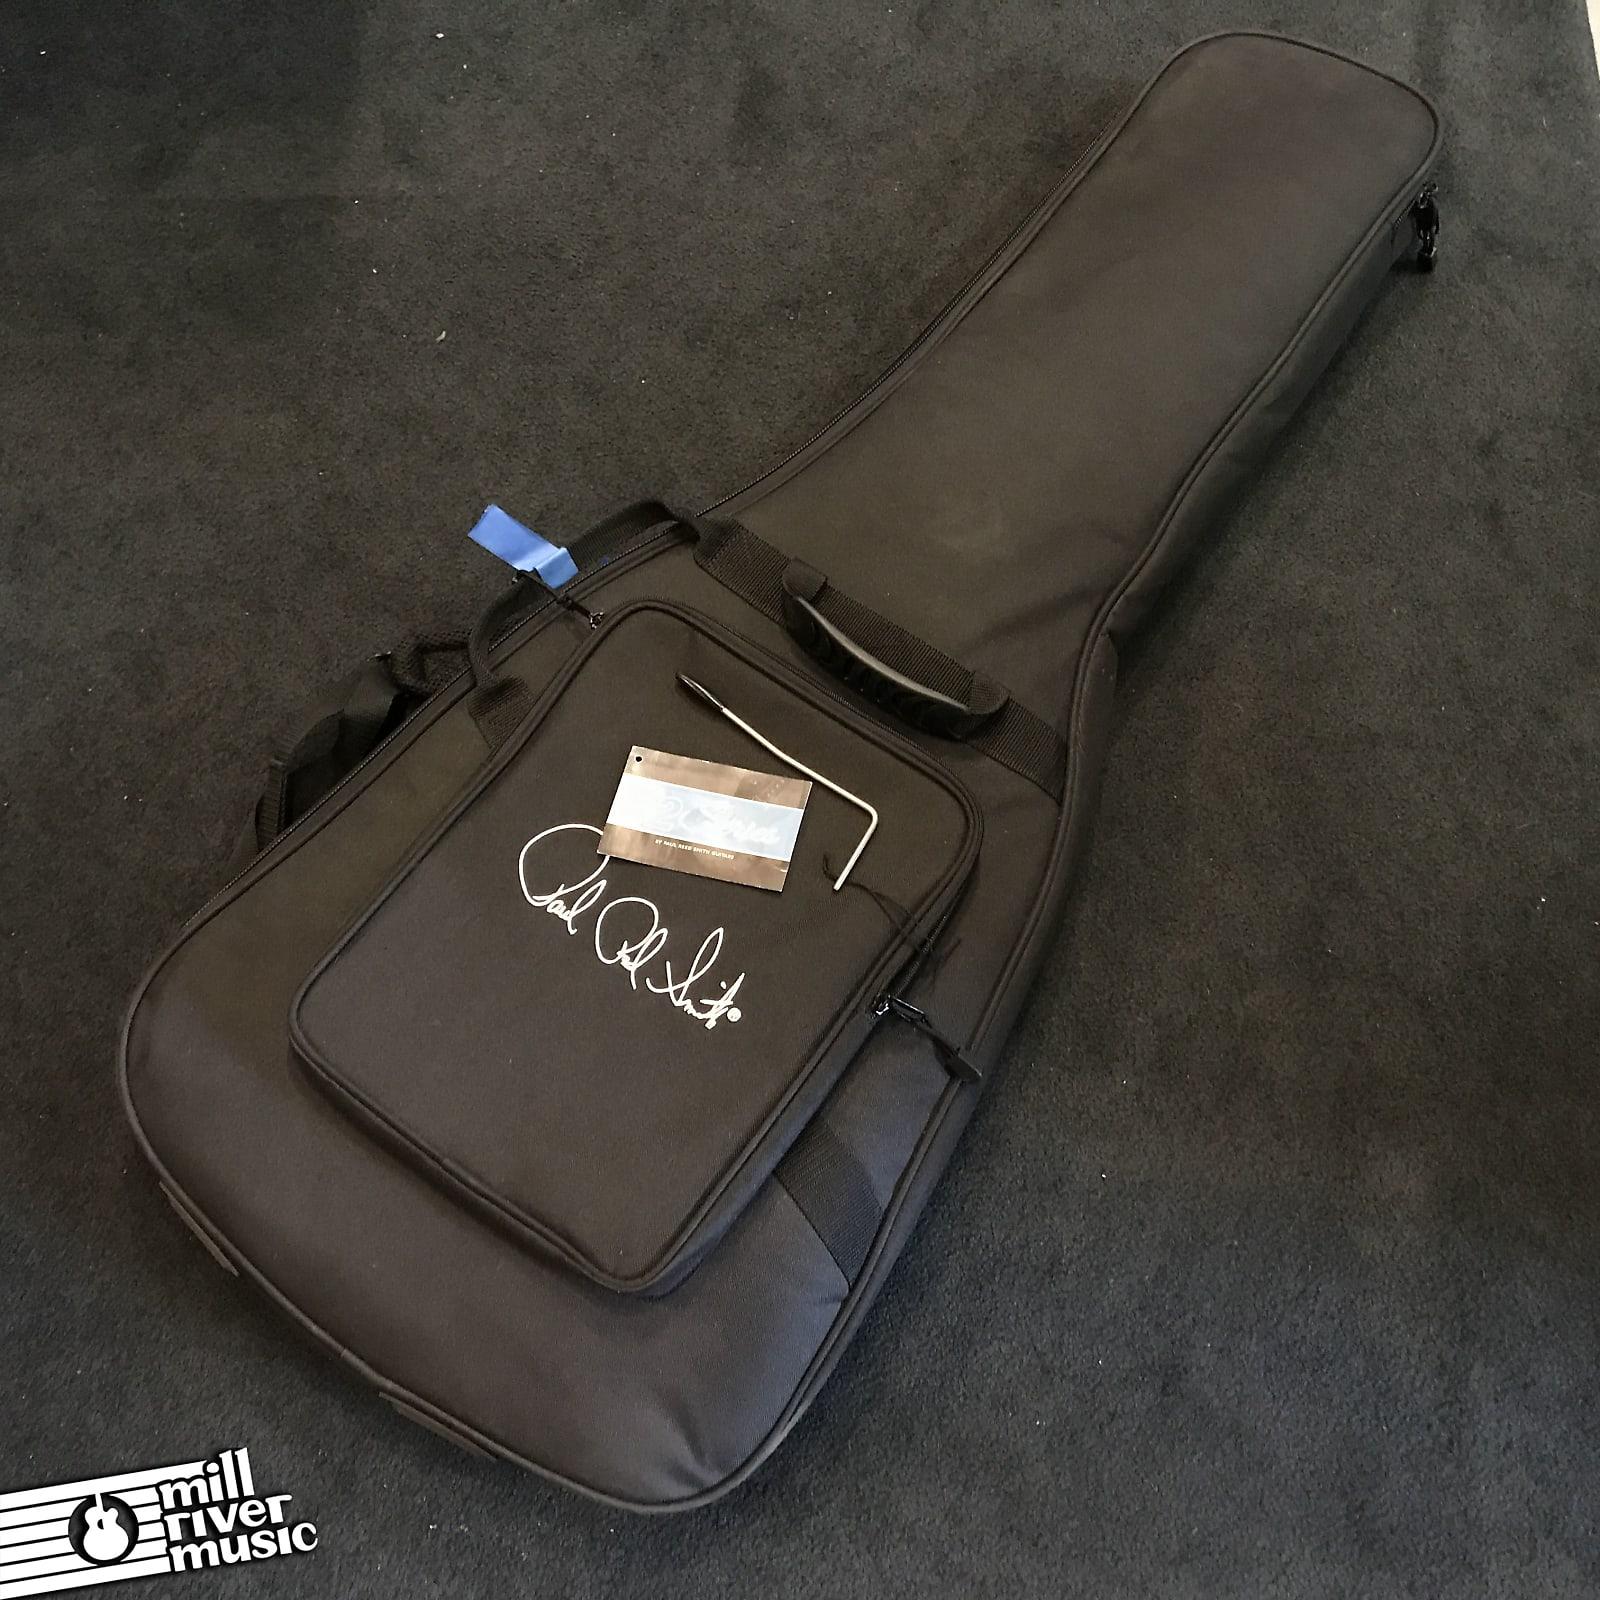 Paul Reed Smith PRS S2 Standard 24 Satin Vintage Cherry 2019 w/ Gig Bag